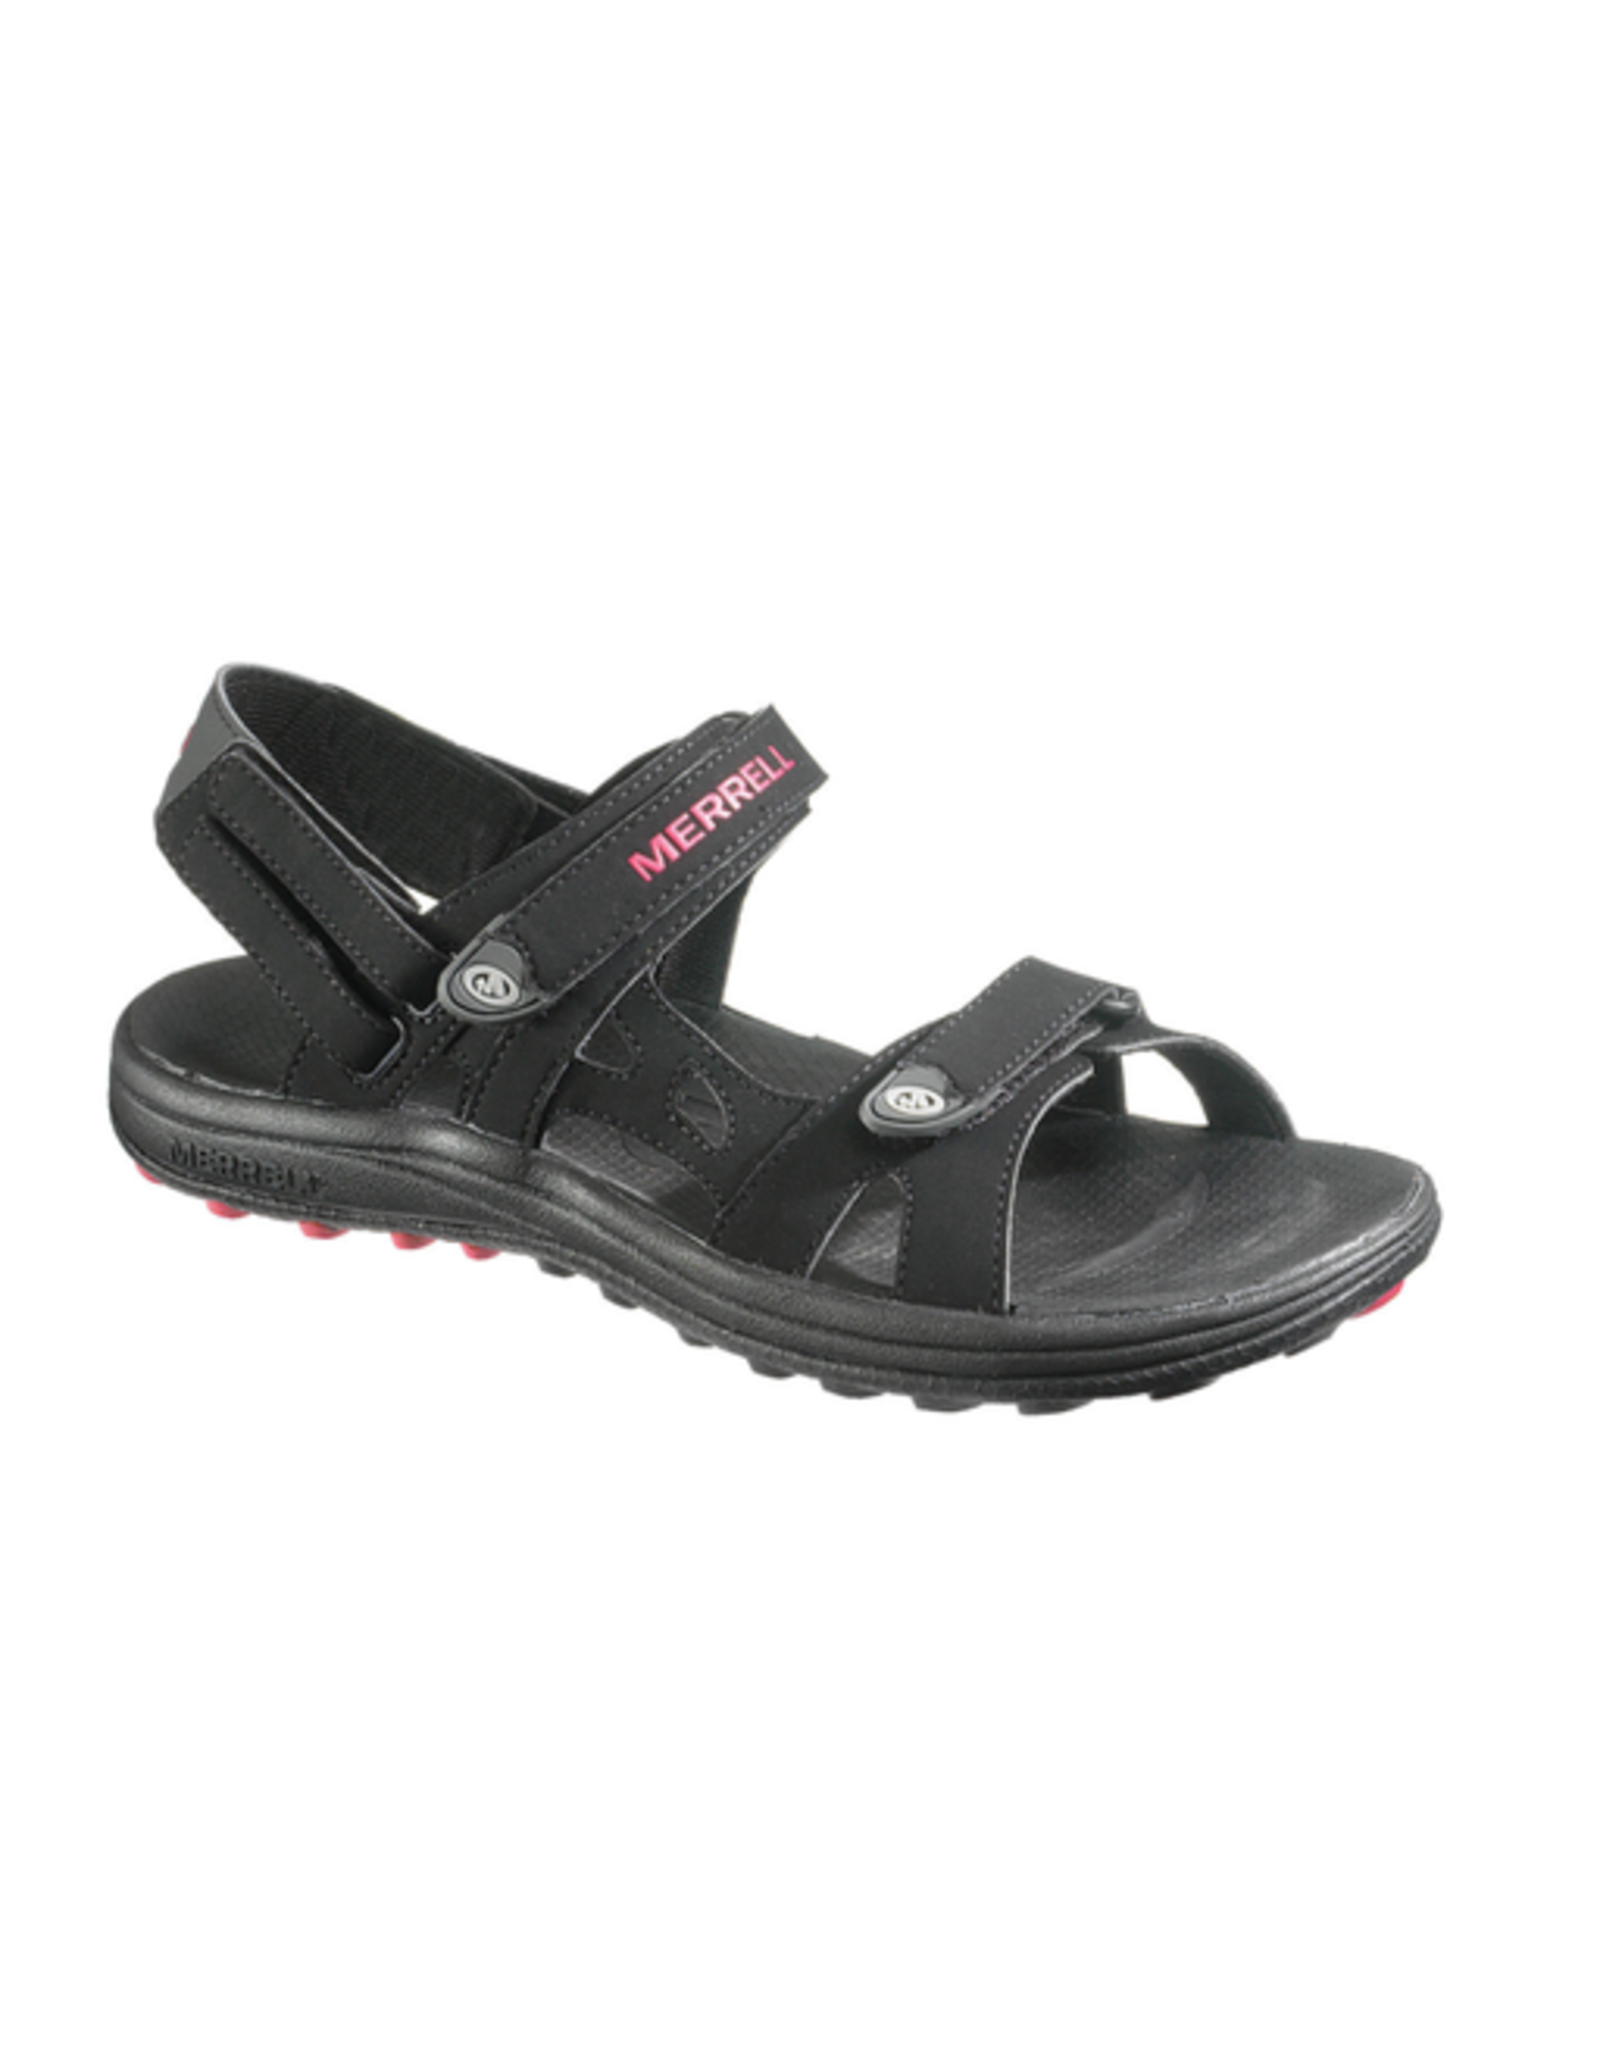 Merrell Merrell Women's Cedrus Convertible Sandal